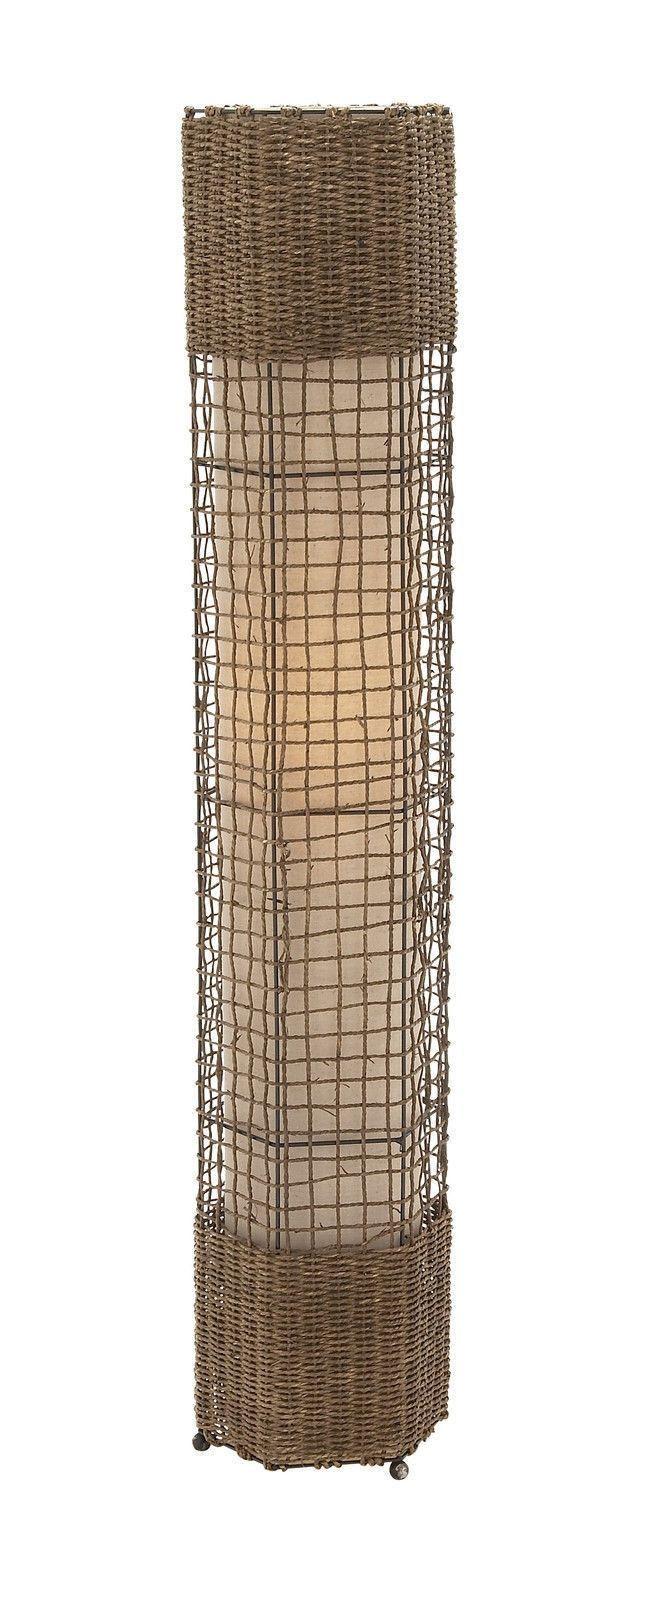 48 tall standing metal woven rattan column floor lamp modern 48 tall standing metal woven rattan column floor lamp modern natural rustic mozeypictures Image collections